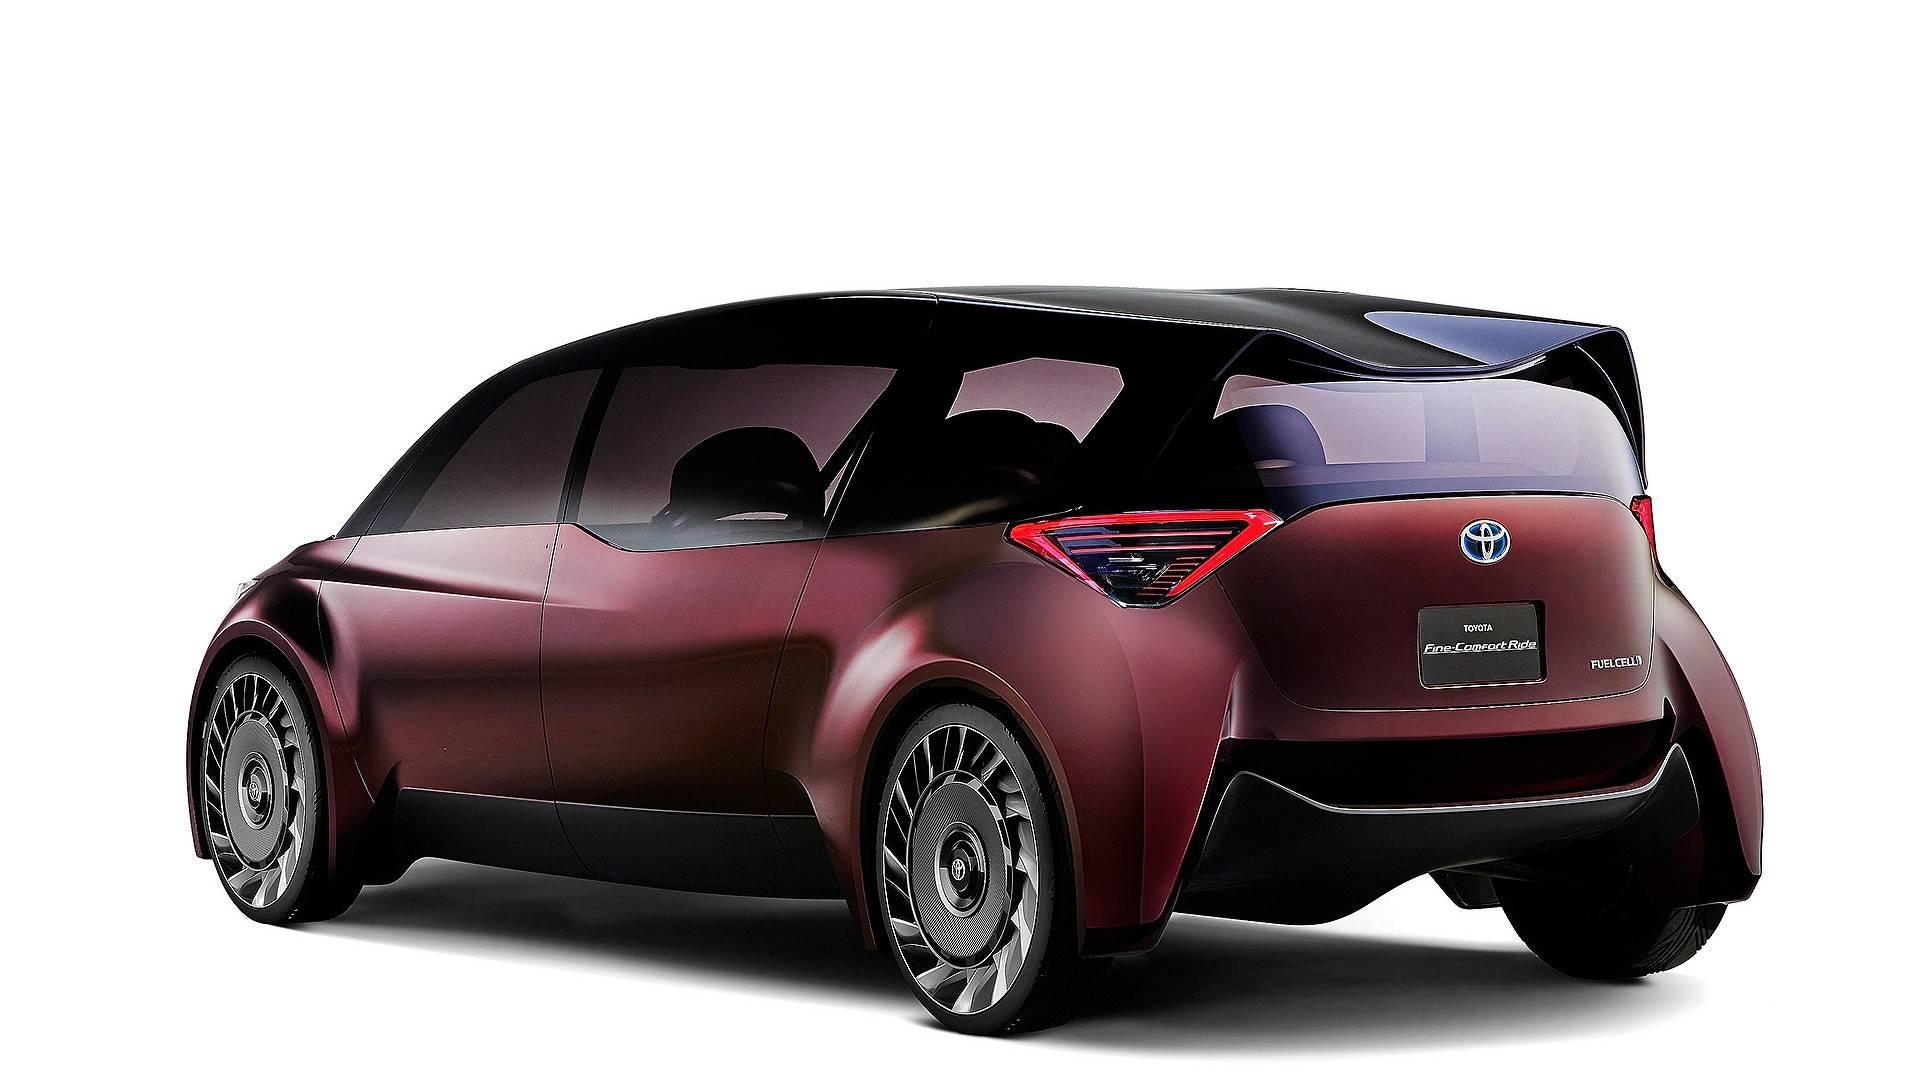 toyota-fine-comfort-ride-concept (9)